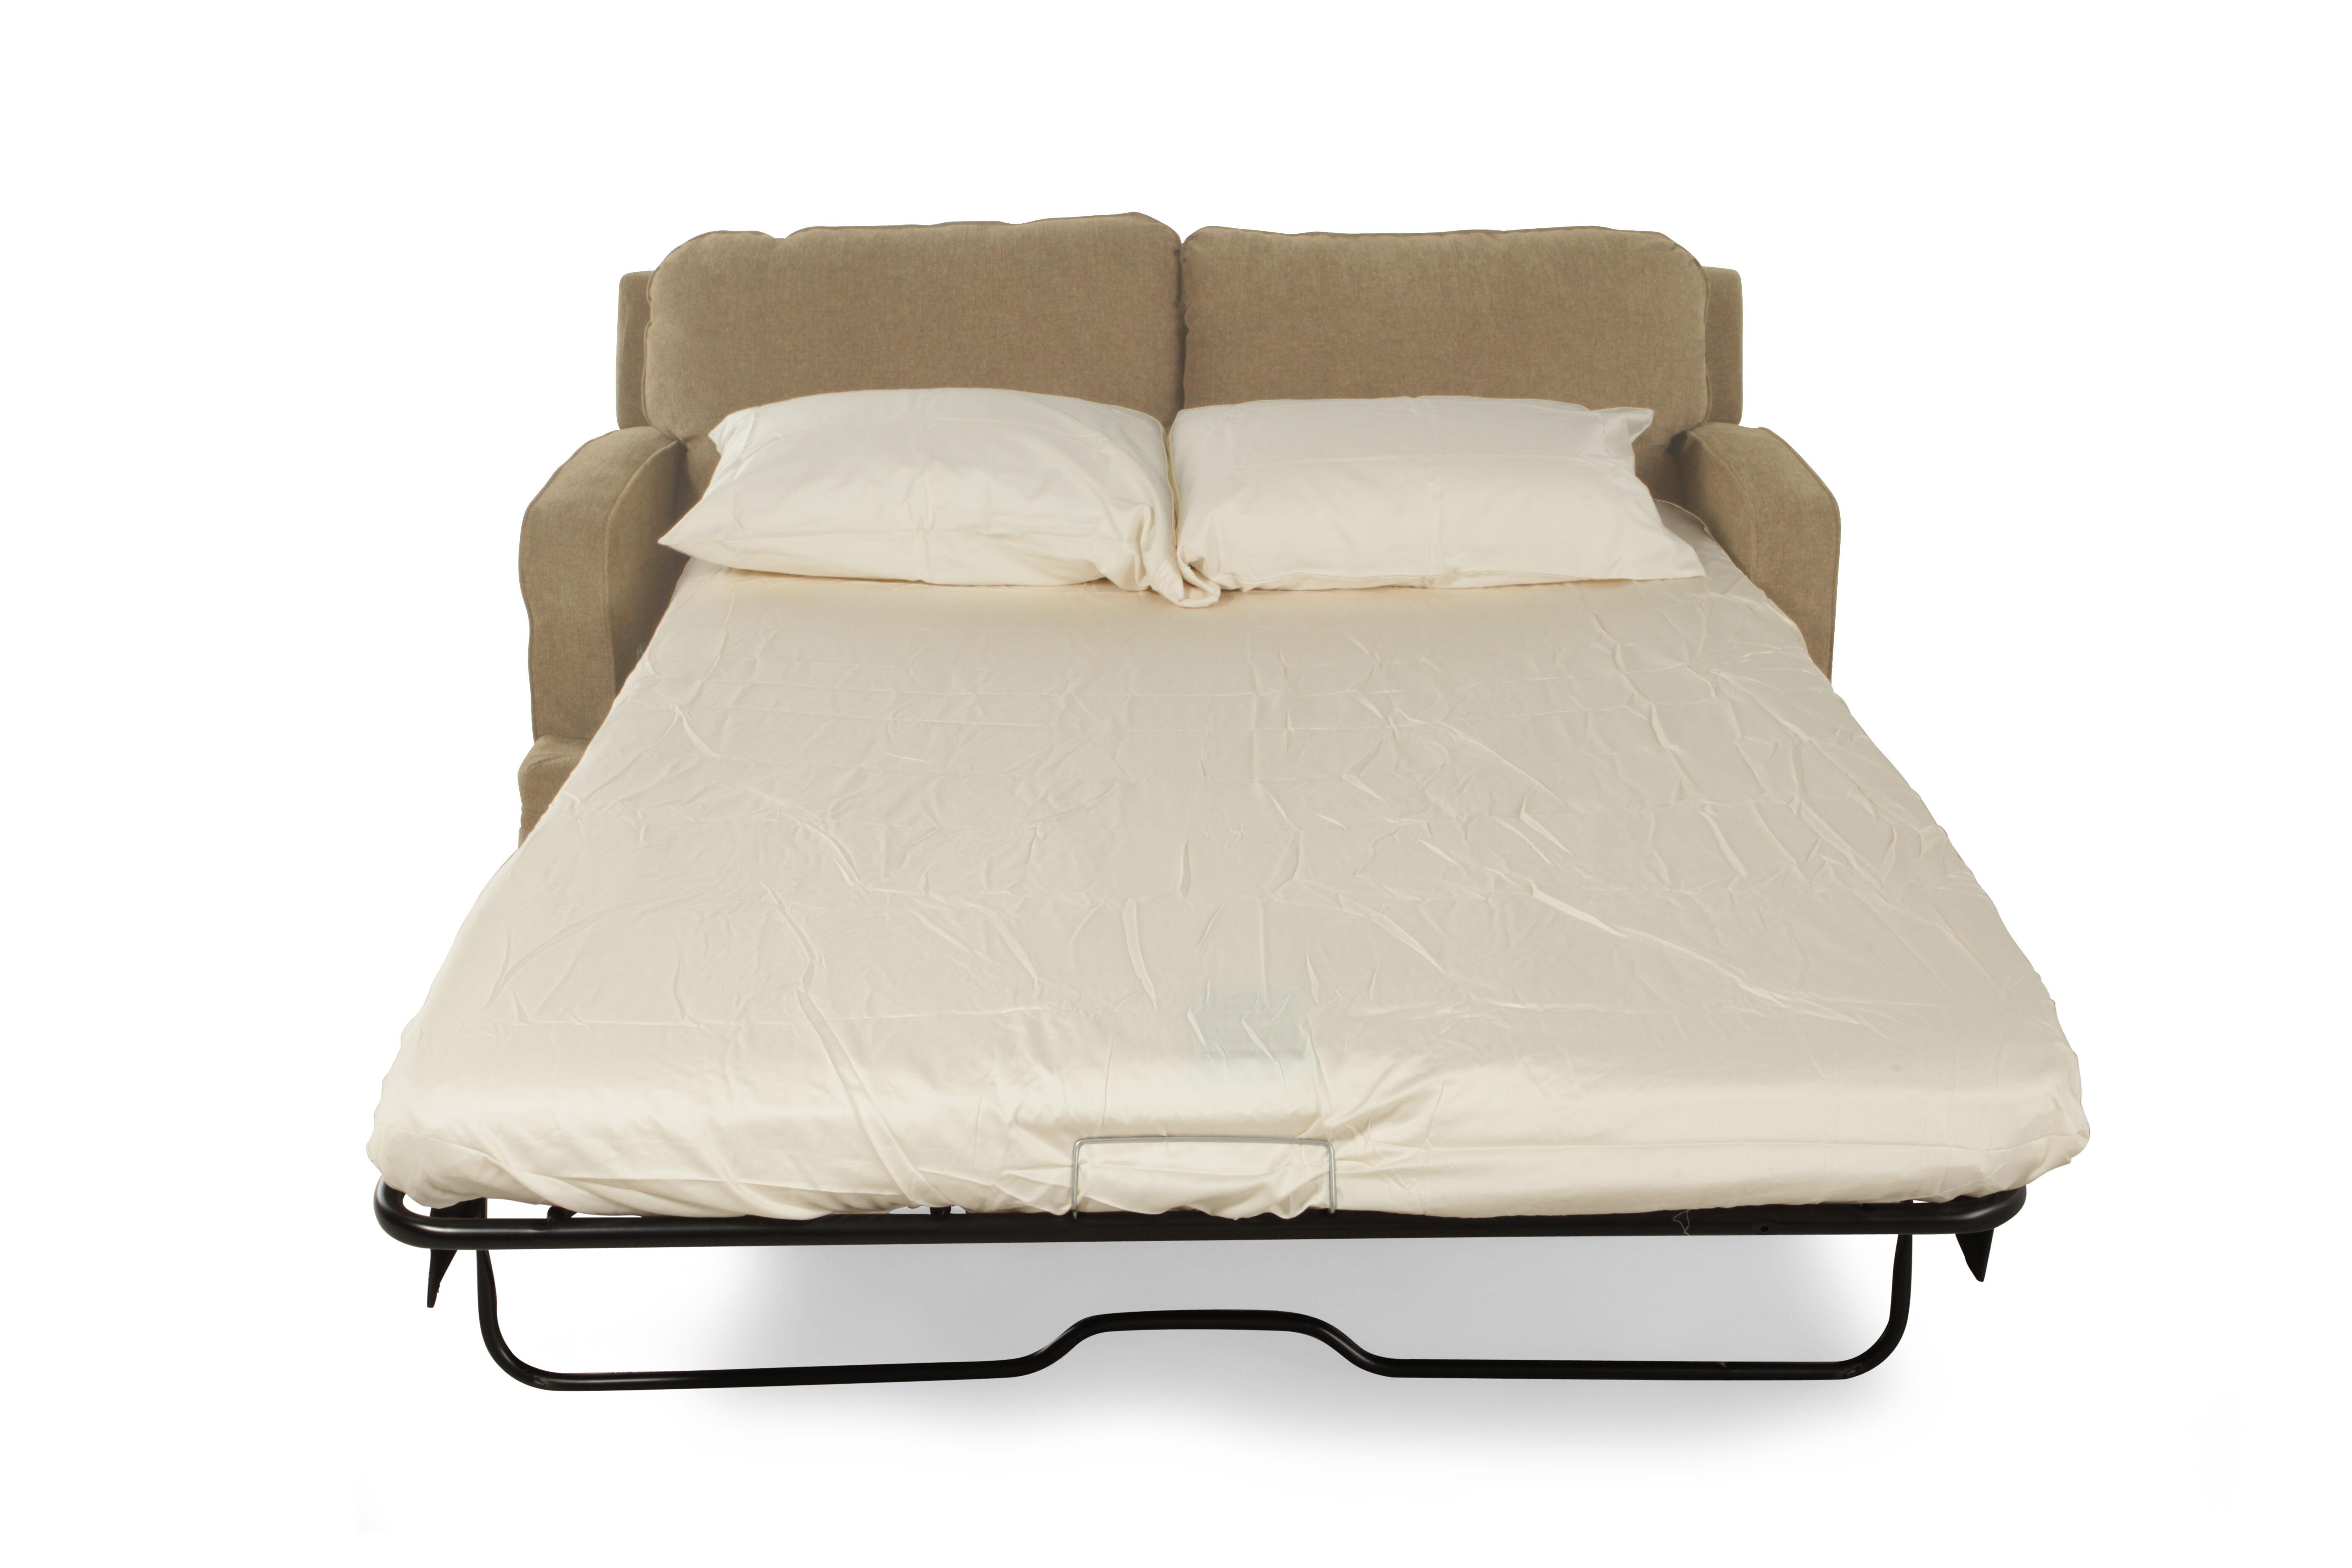 LaZBoy Diana Sesame Full Sleeper Sofa Mathis Brothers Furniture